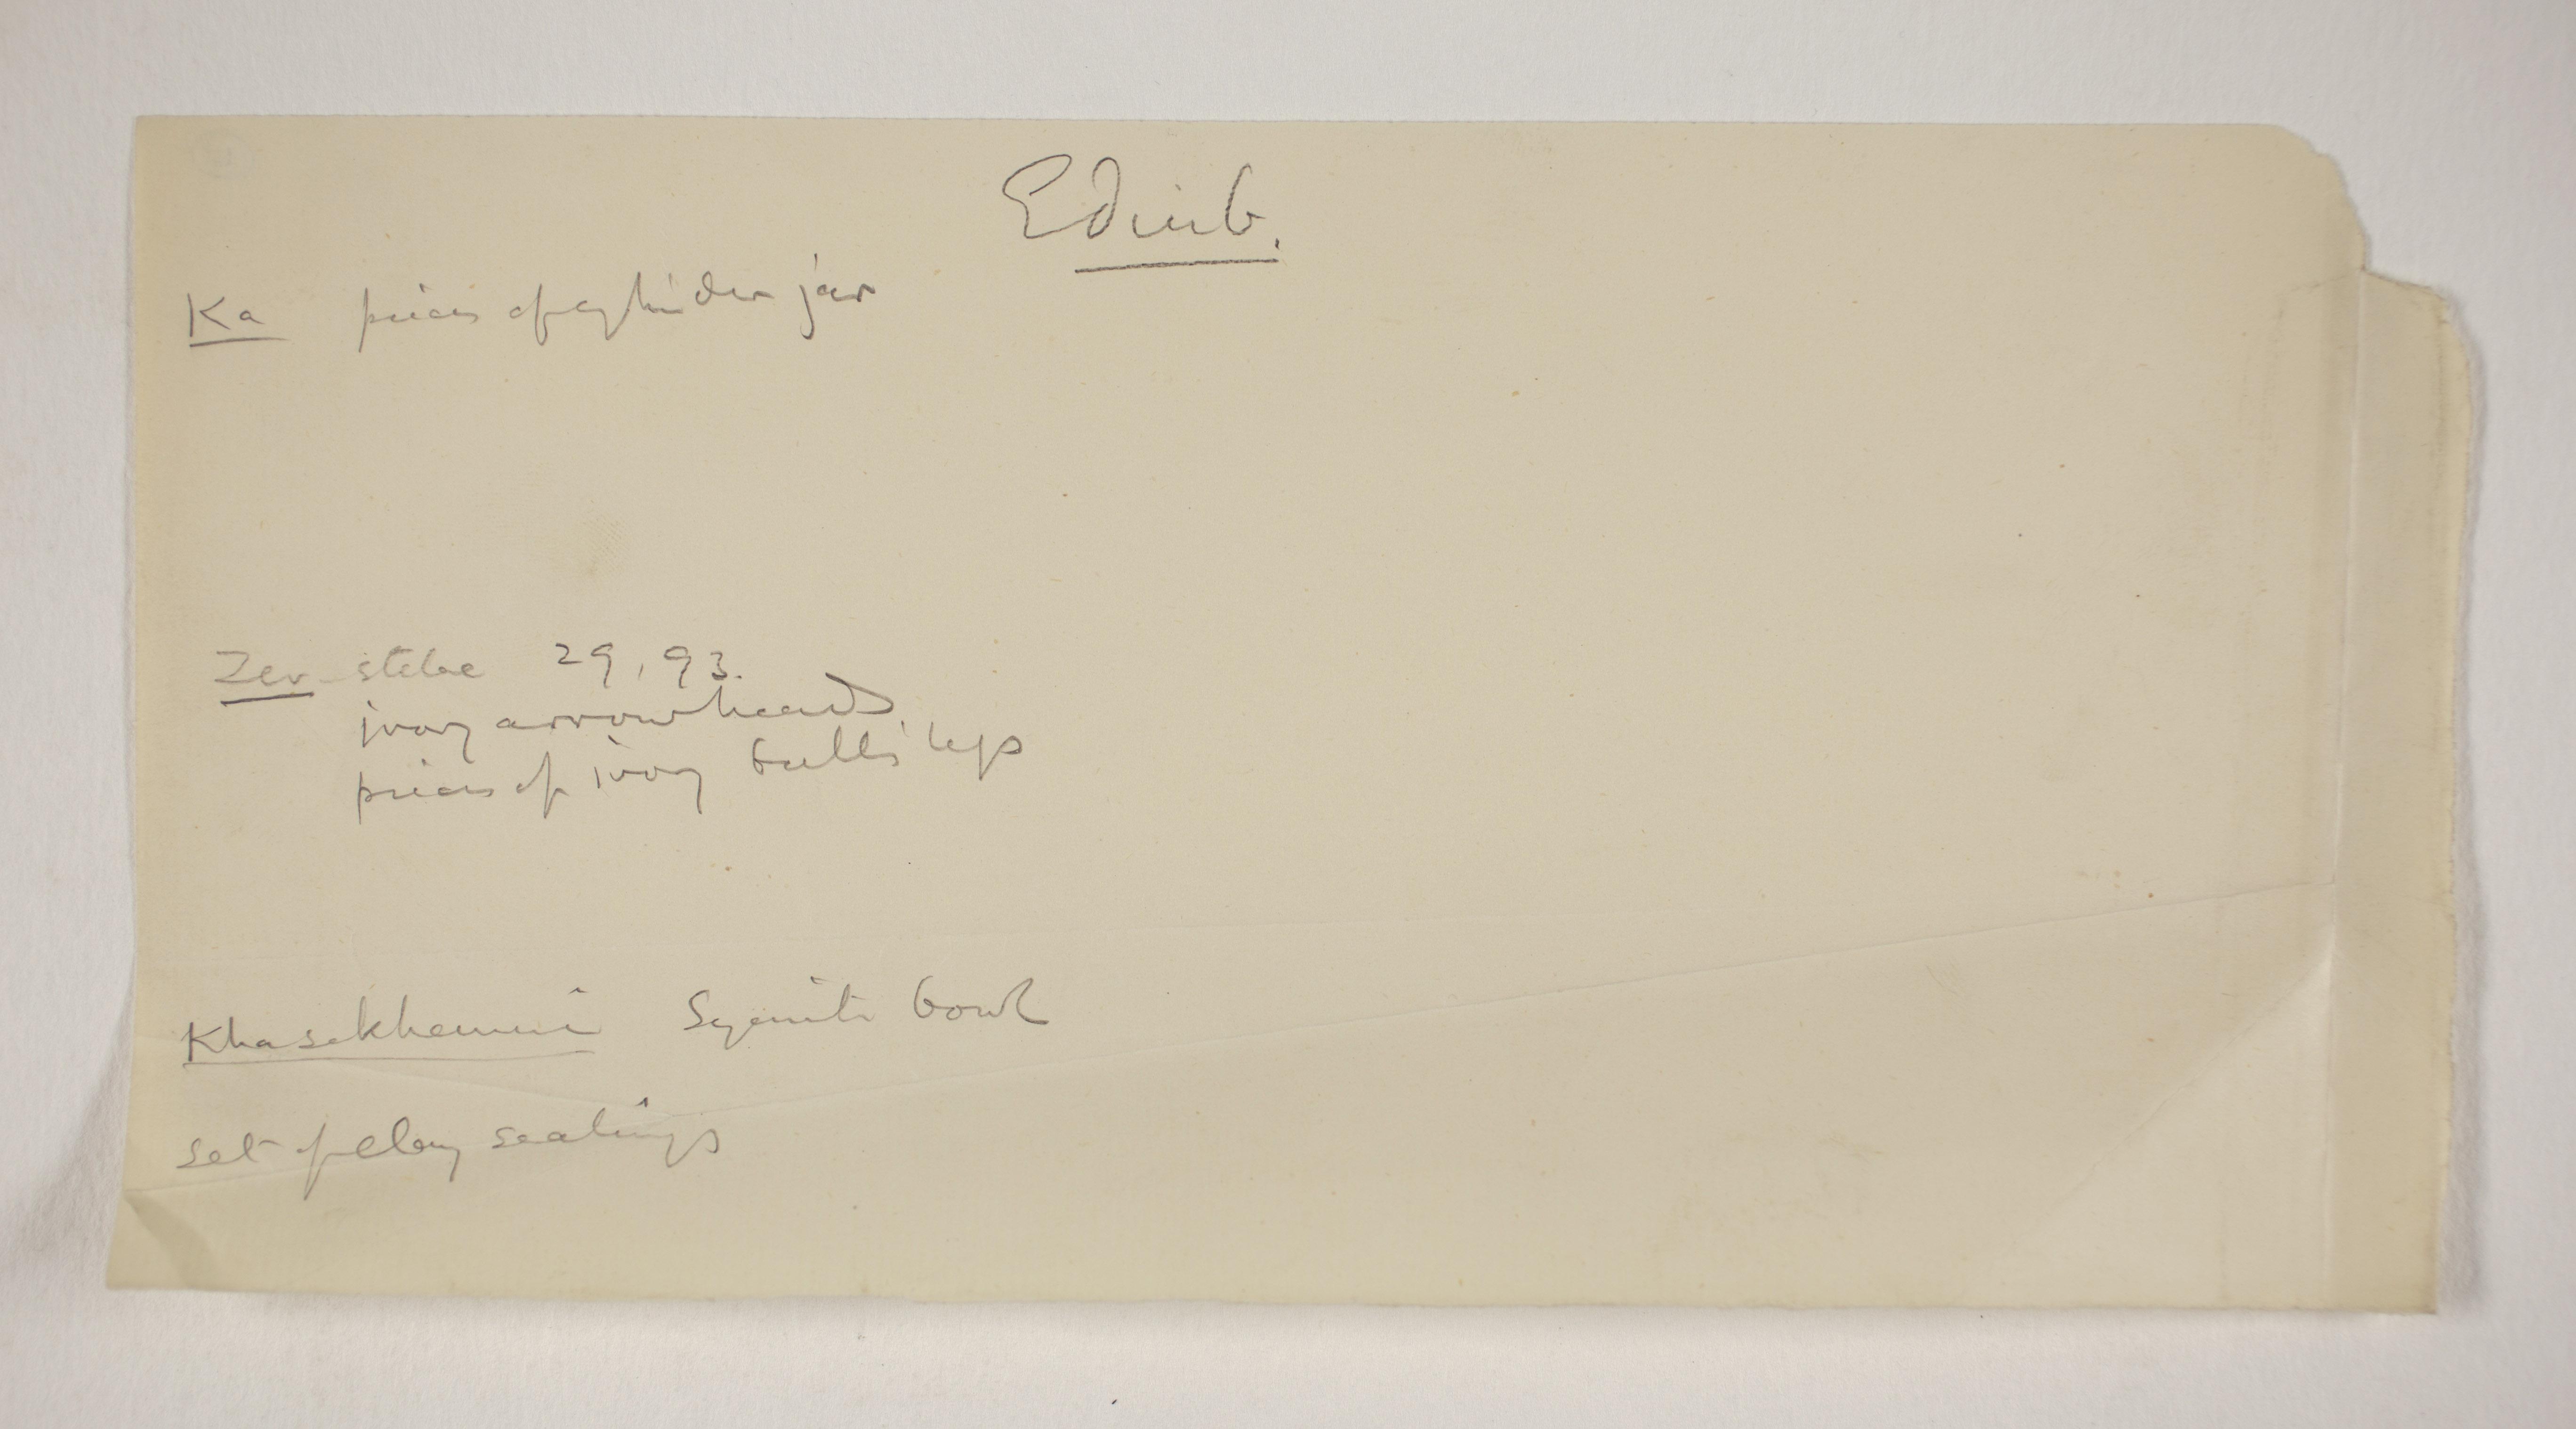 Abydos, Bet Khallaf, el-Mahasna 1900-1901, Individual Institution List, PMA/WFP1/D/9/17